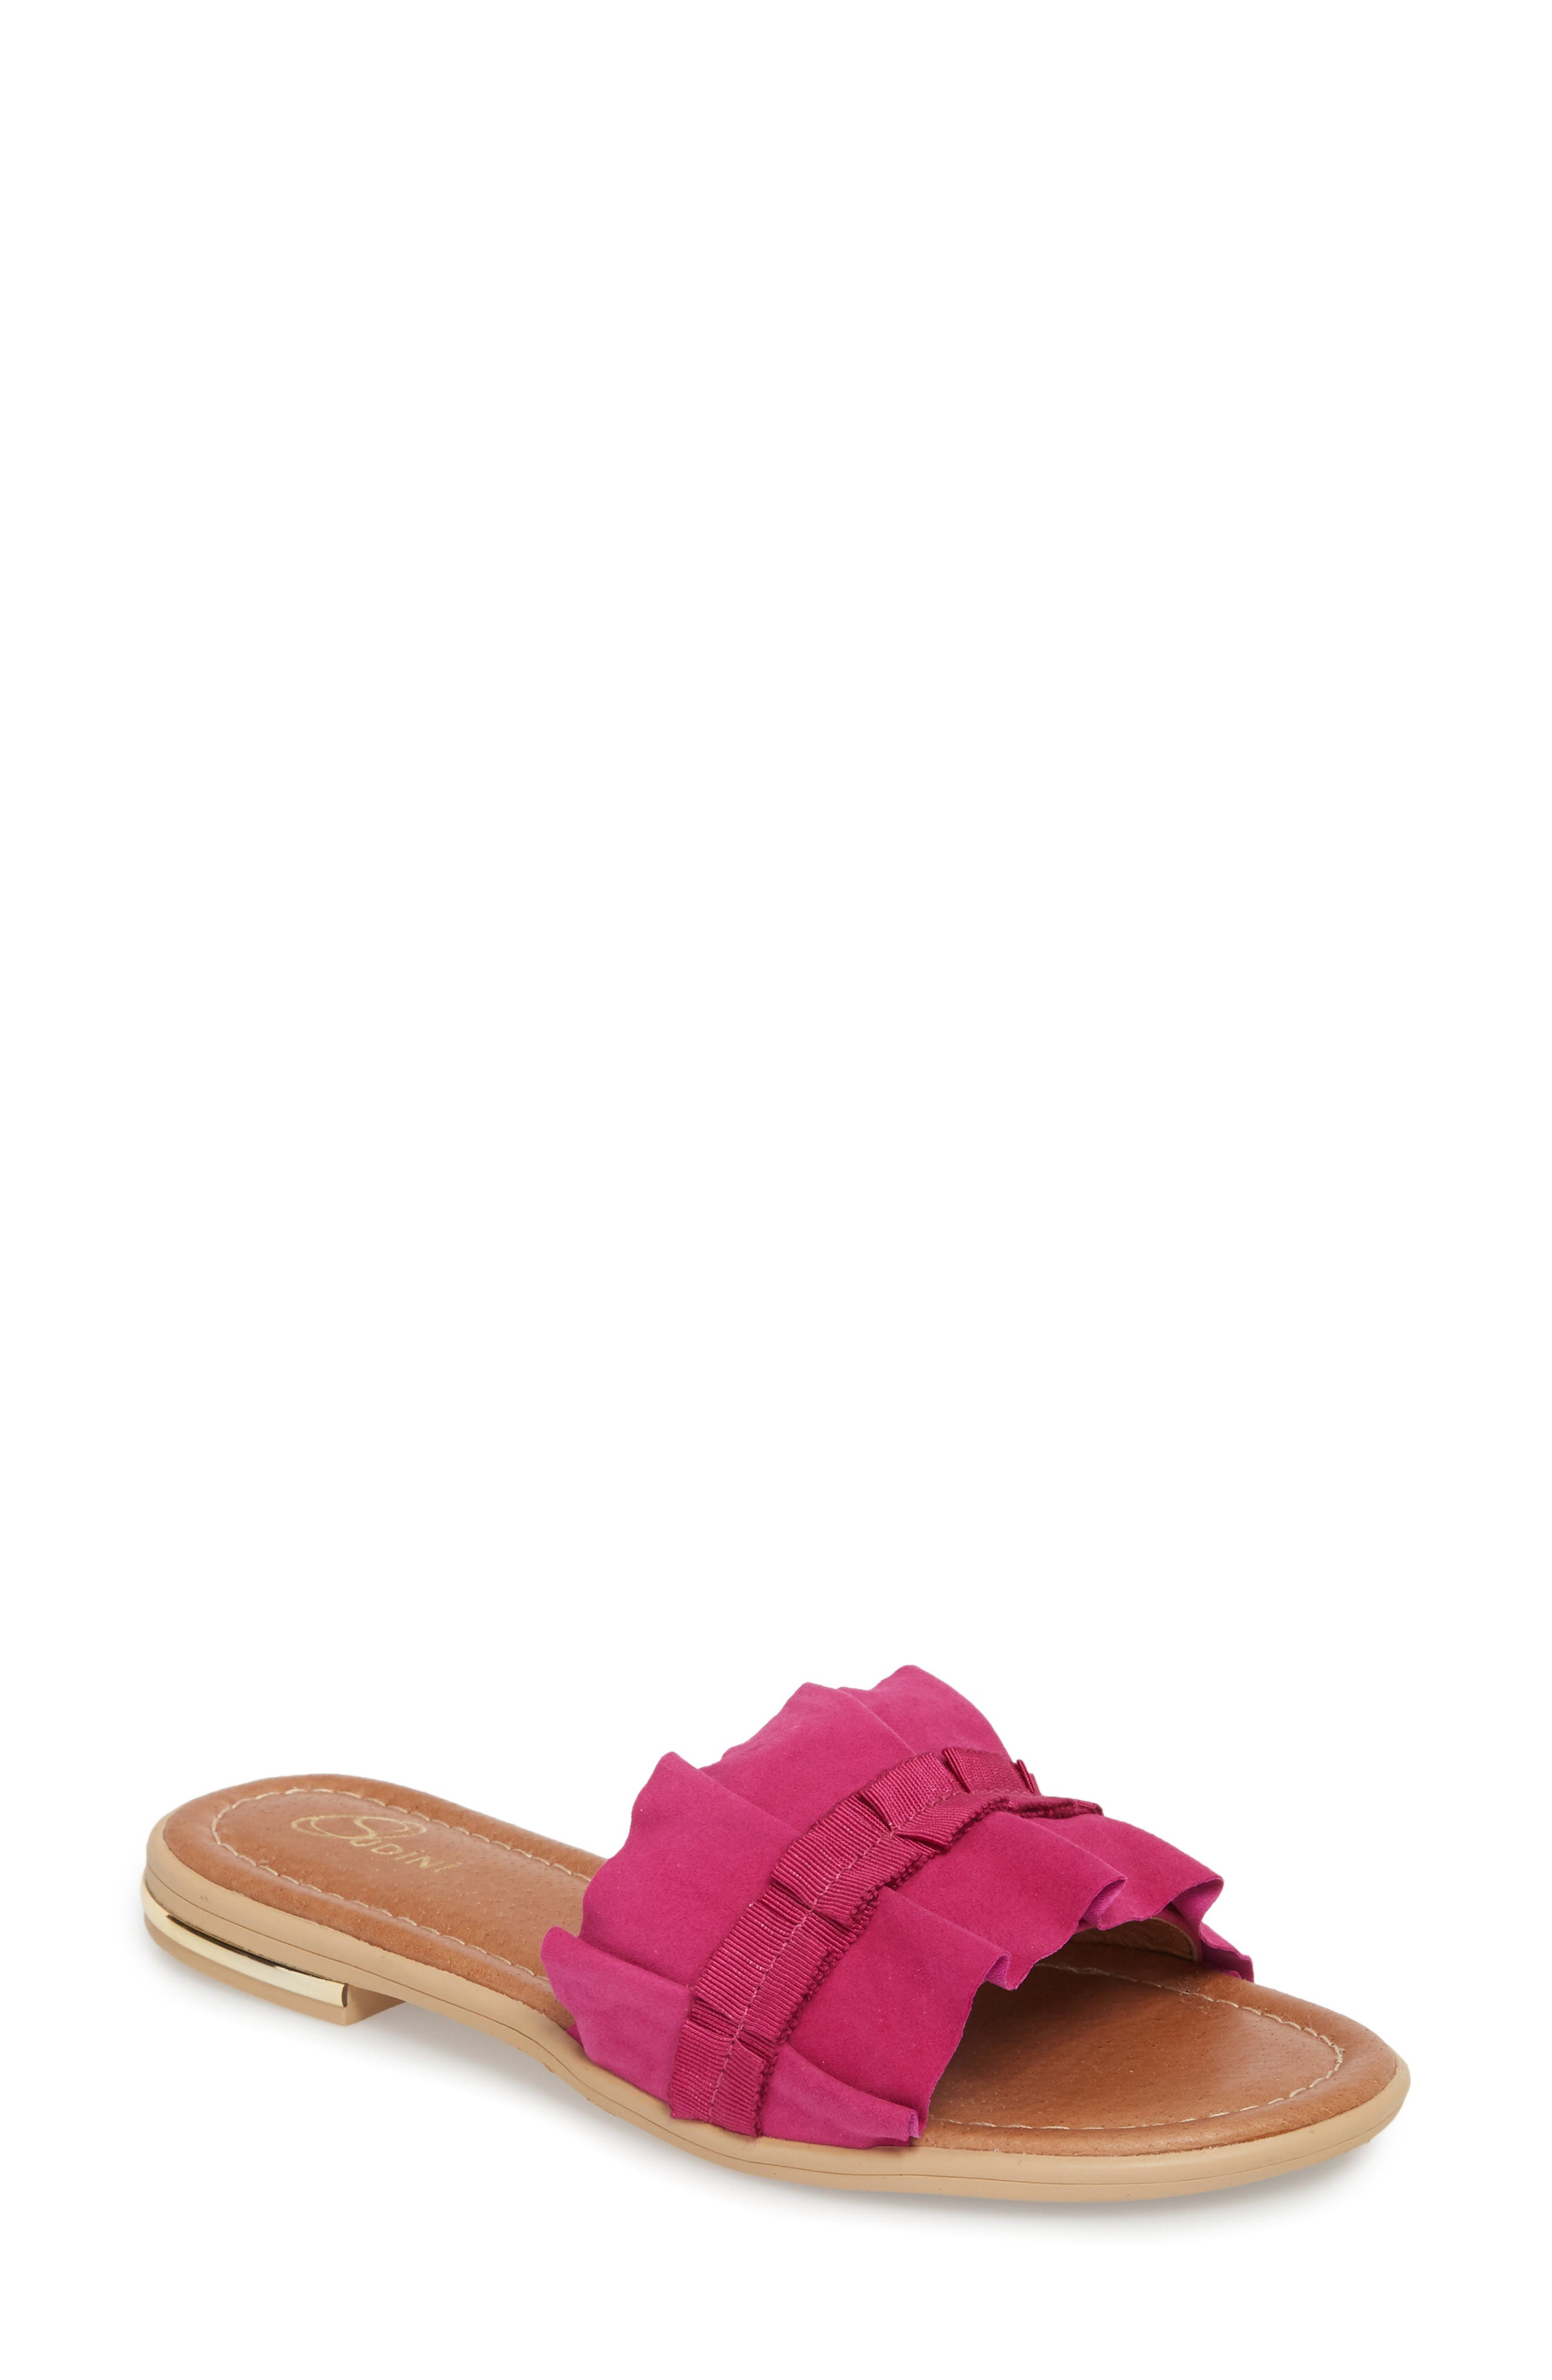 Sudini Ravenna Slide Sandal, Pink